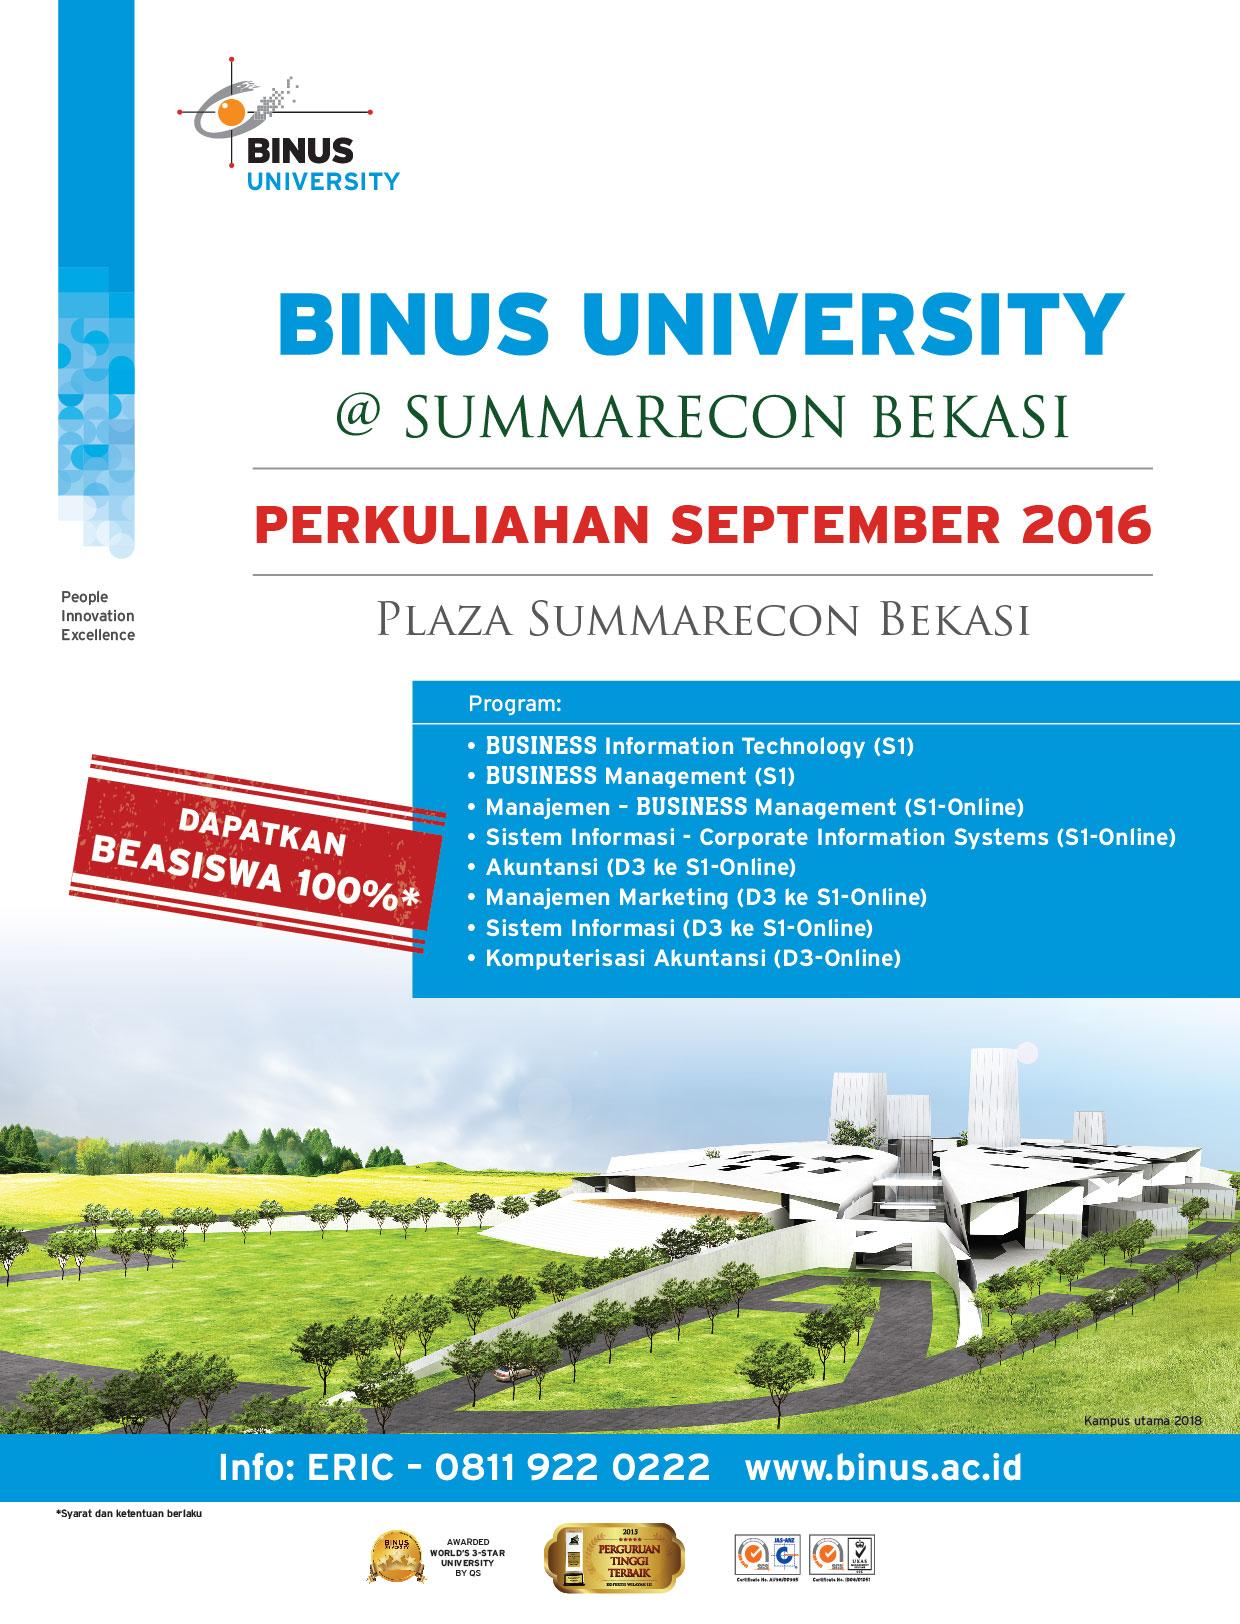 BINUS UNIVERSITY Hadir di Summarecon Bekasi